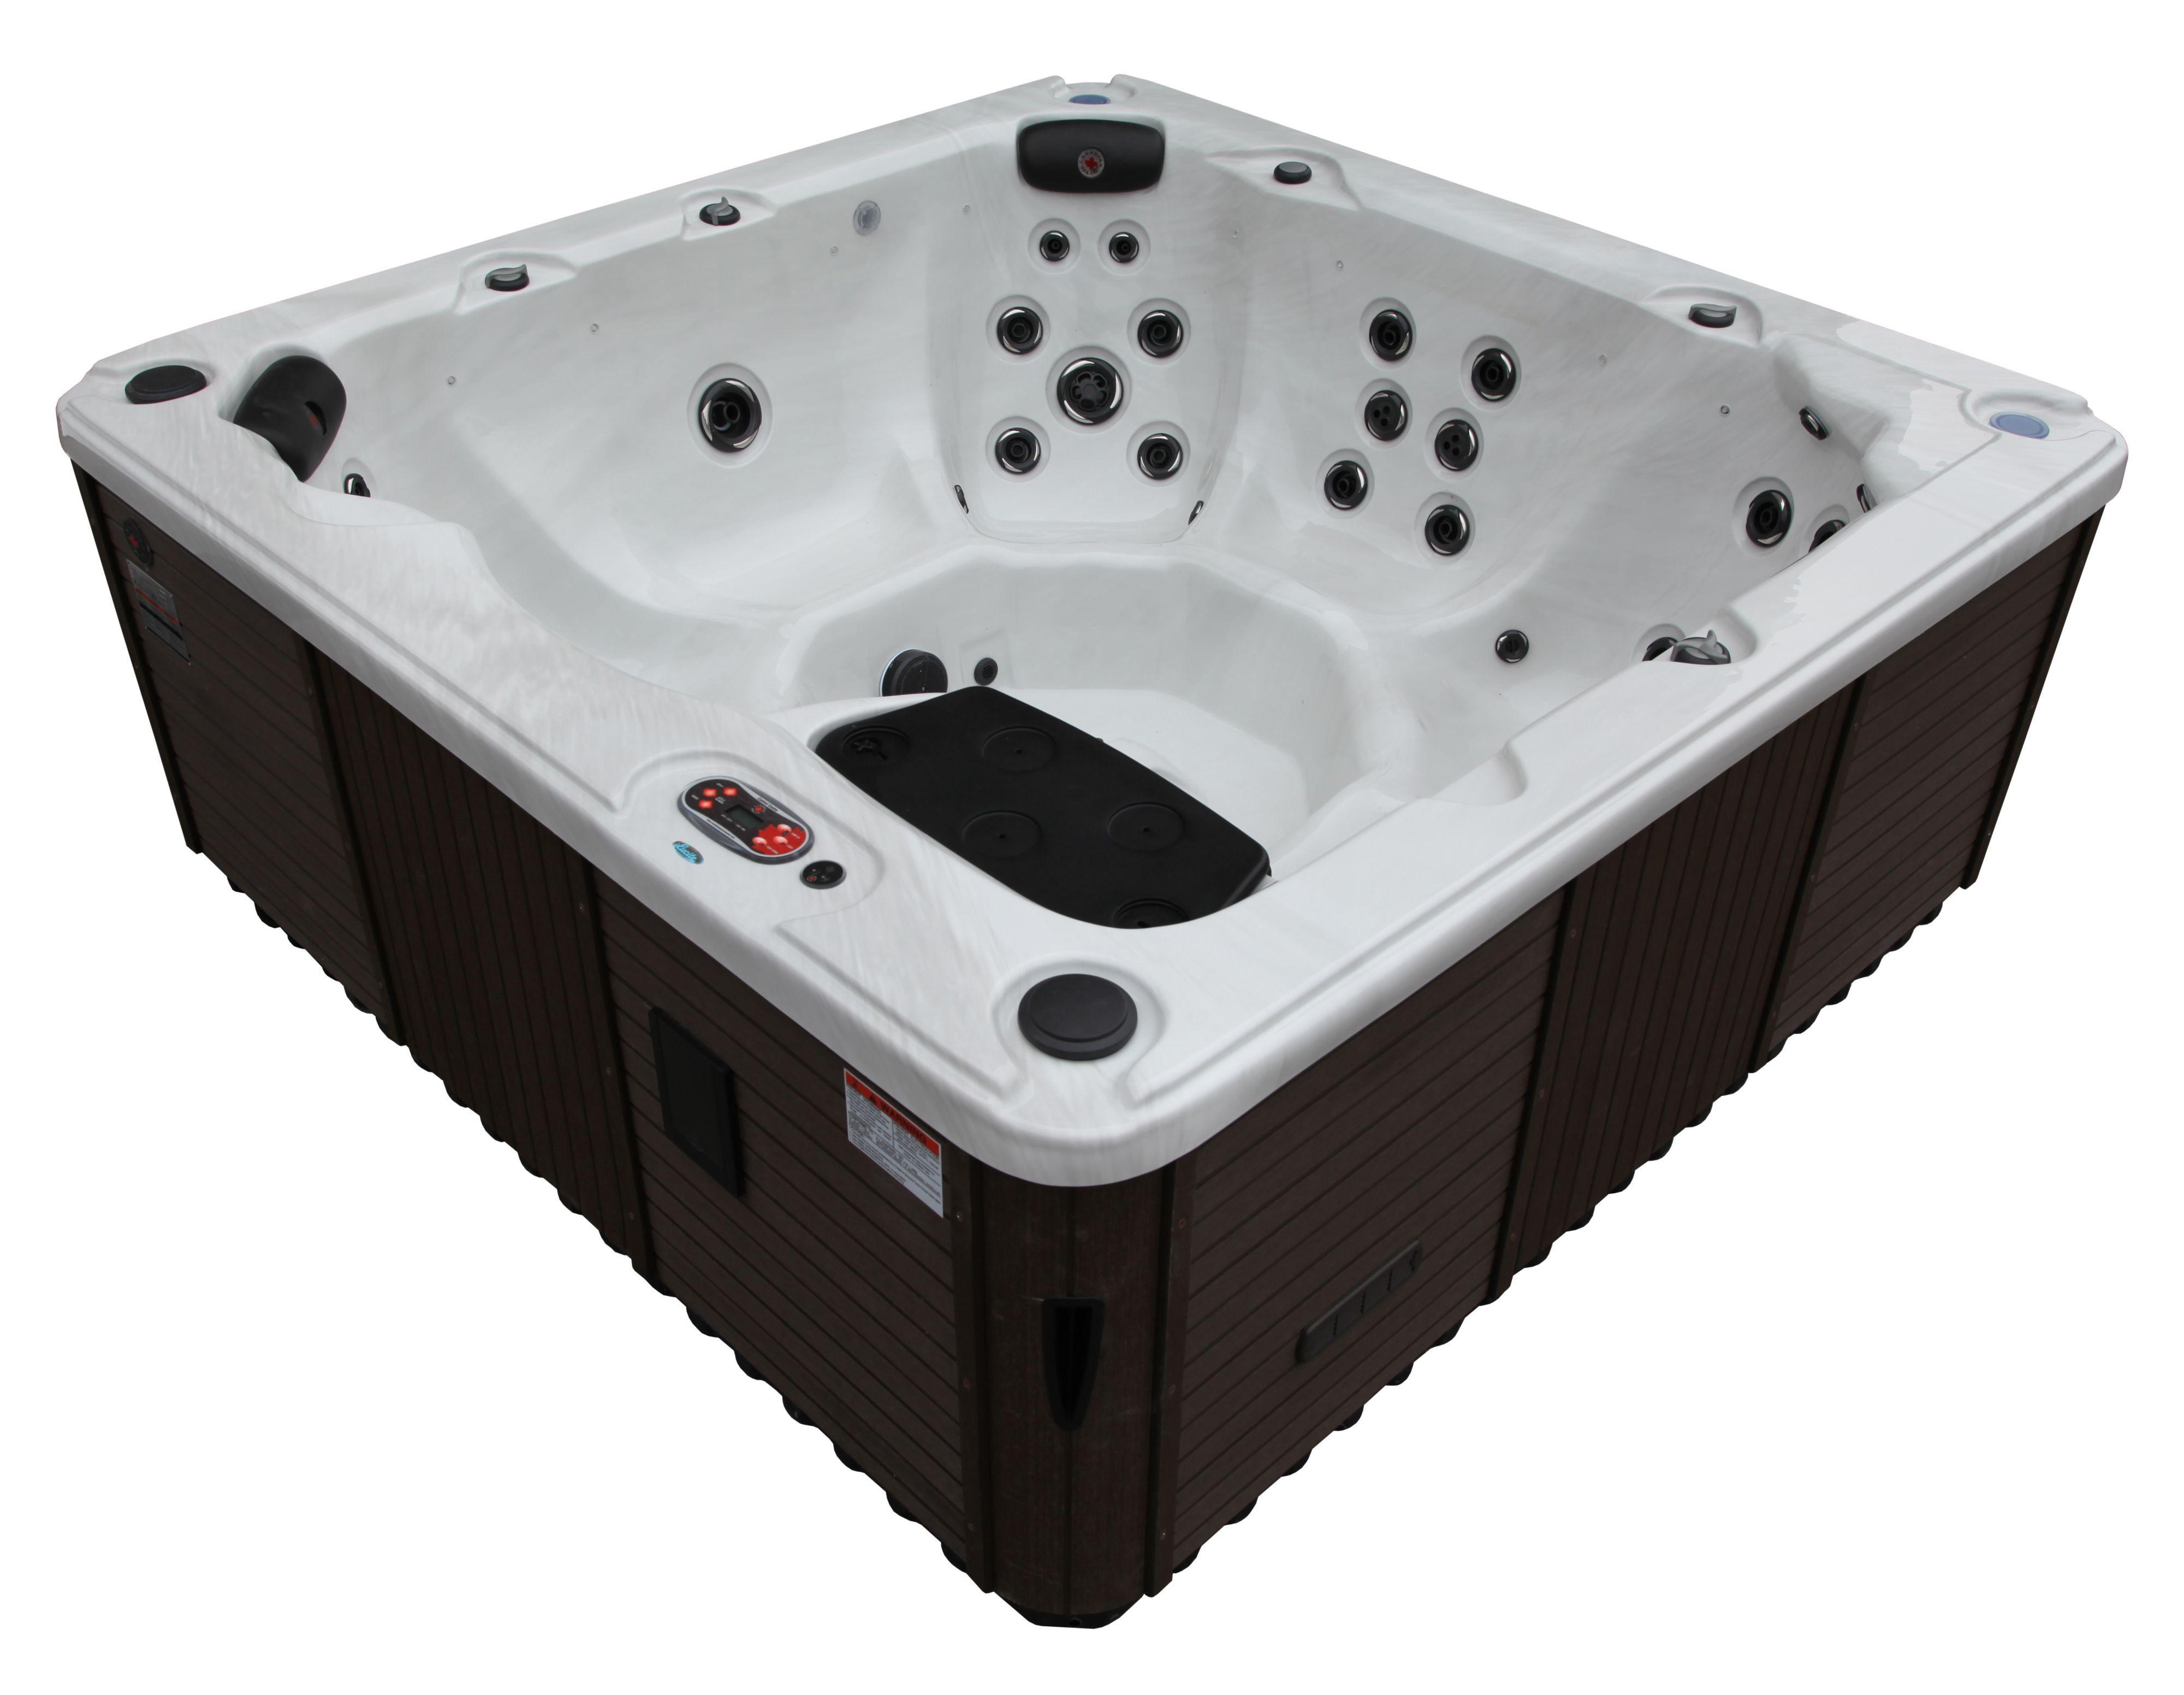 Canadian Spa Victoria 7 Person Hot Tub Canadian Spa Spa Tub Spa